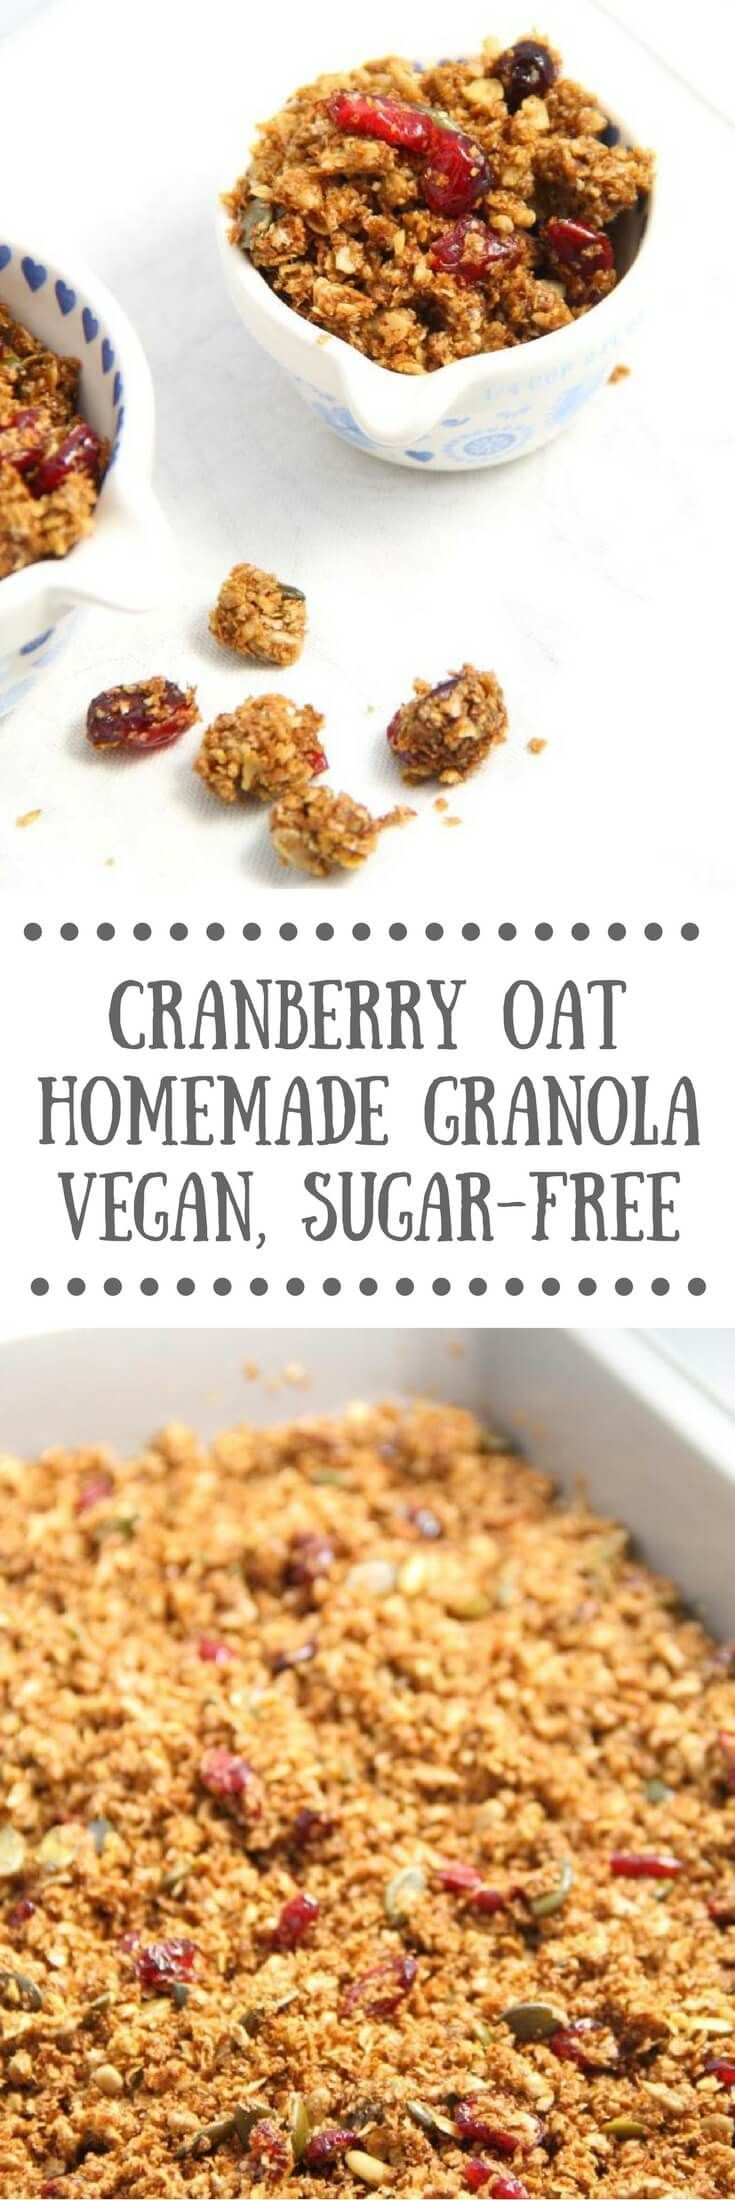 Cranberry oat homemade granola vegan sugar free breakfast recipe cranberry oat homemade granola vegan sugar free breakfast recipe ccuart Image collections